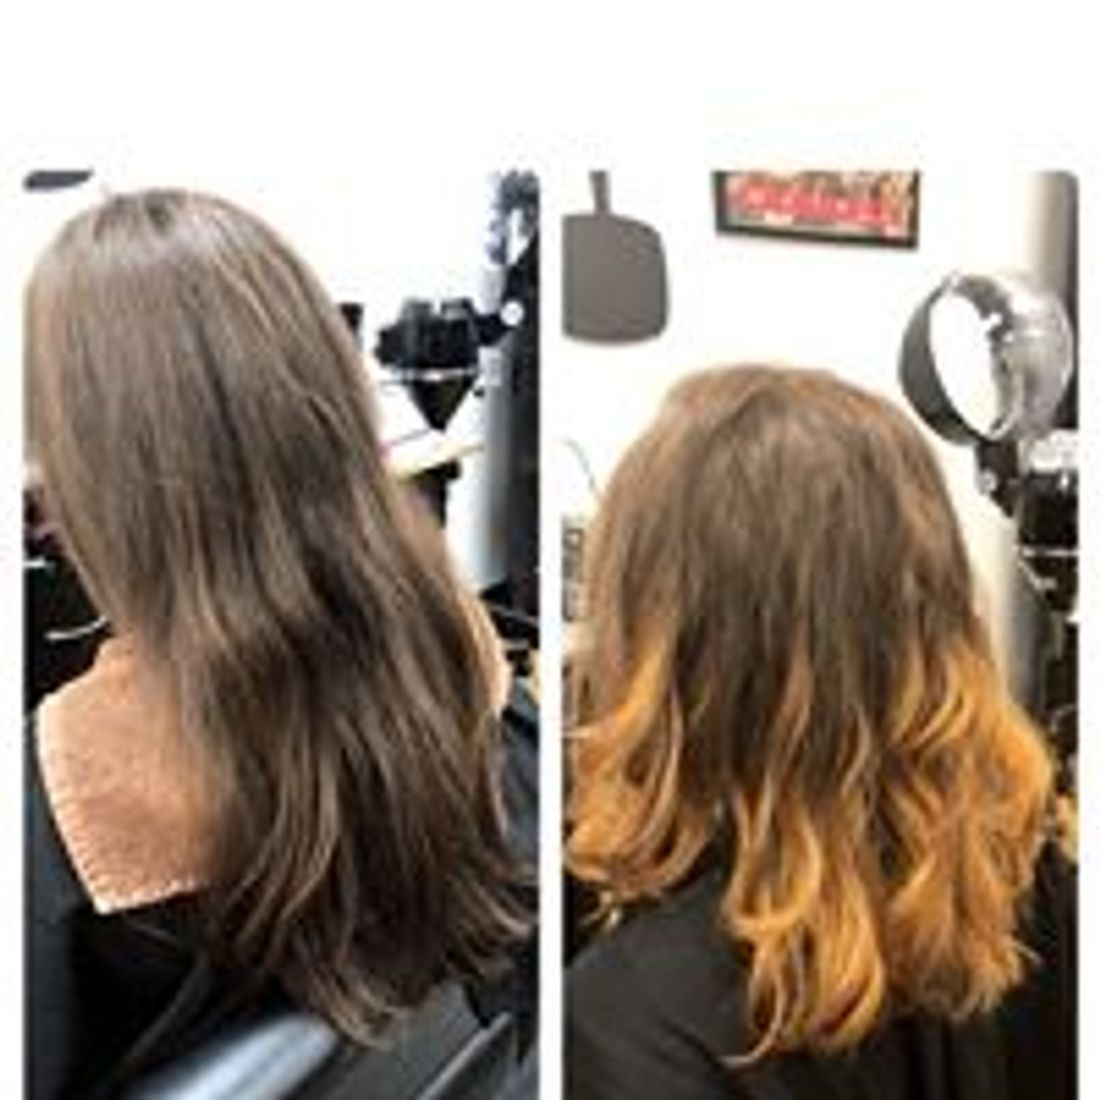 Balayage, Harircut, Hair Color